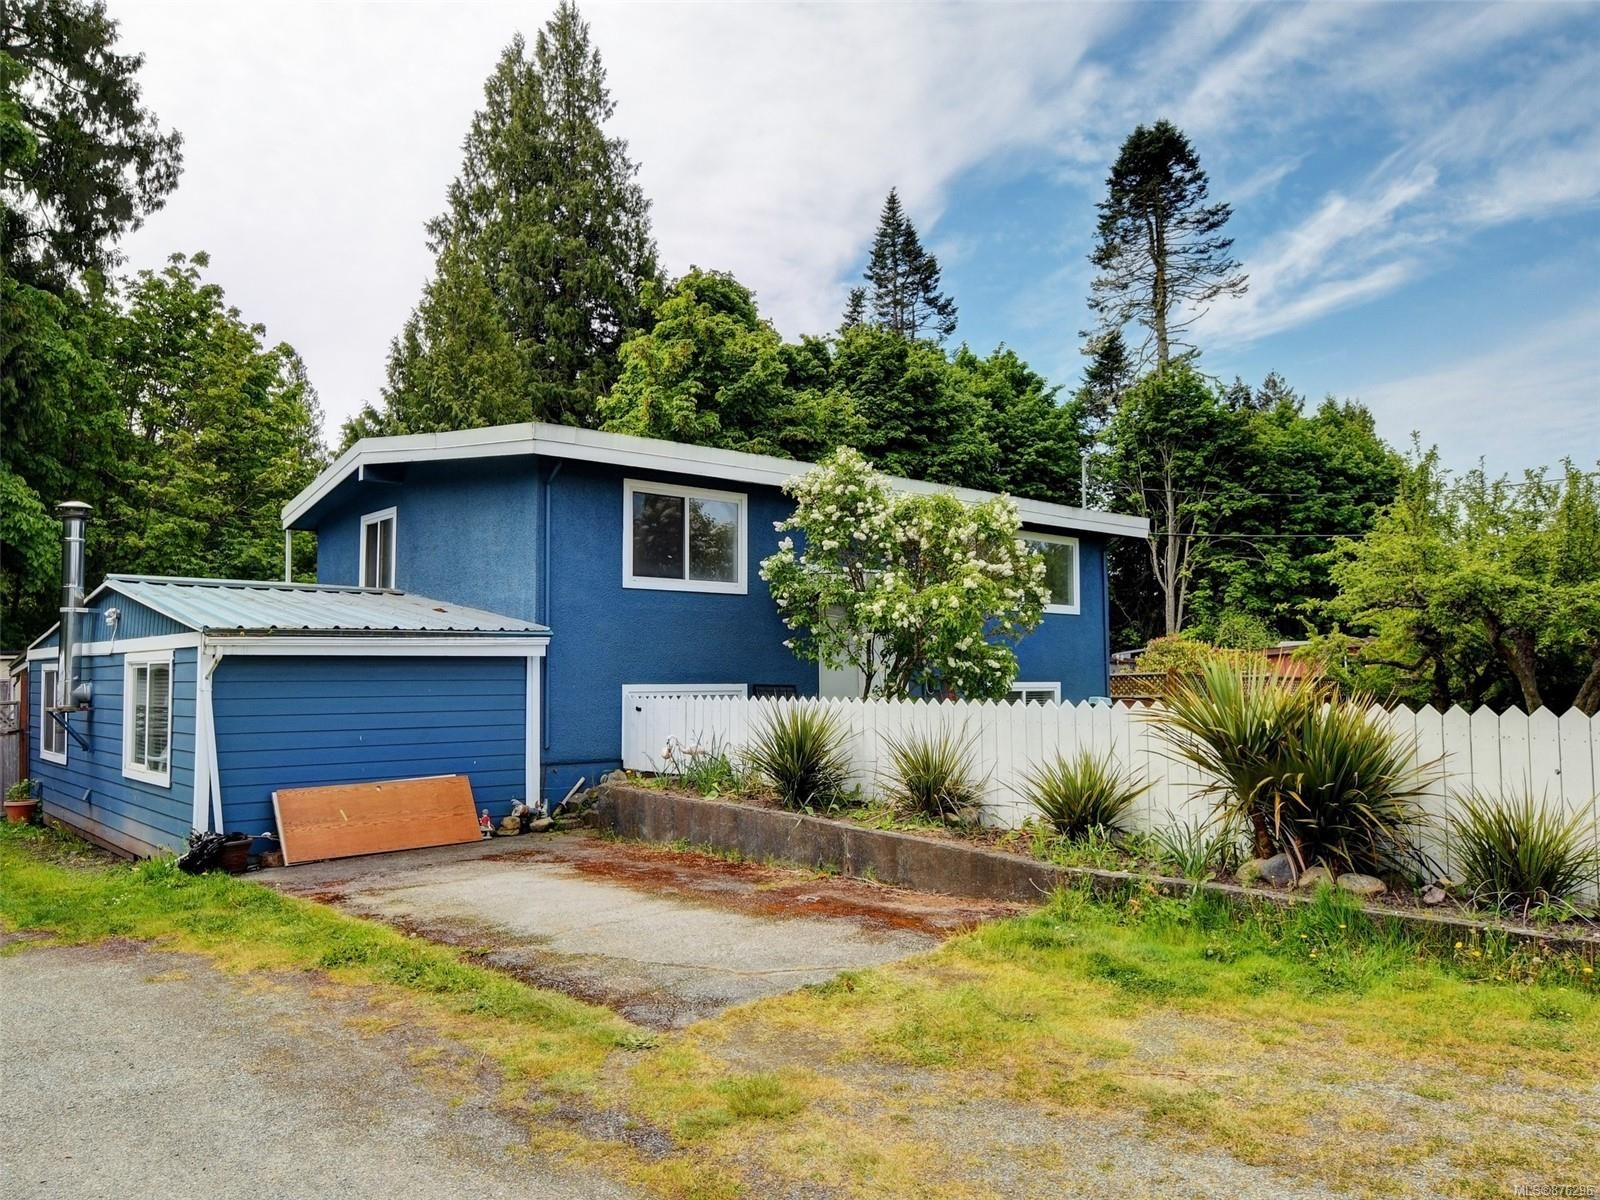 Main Photo: 6243 Derbend Rd in : Sk Billings Spit House for sale (Sooke)  : MLS®# 876296